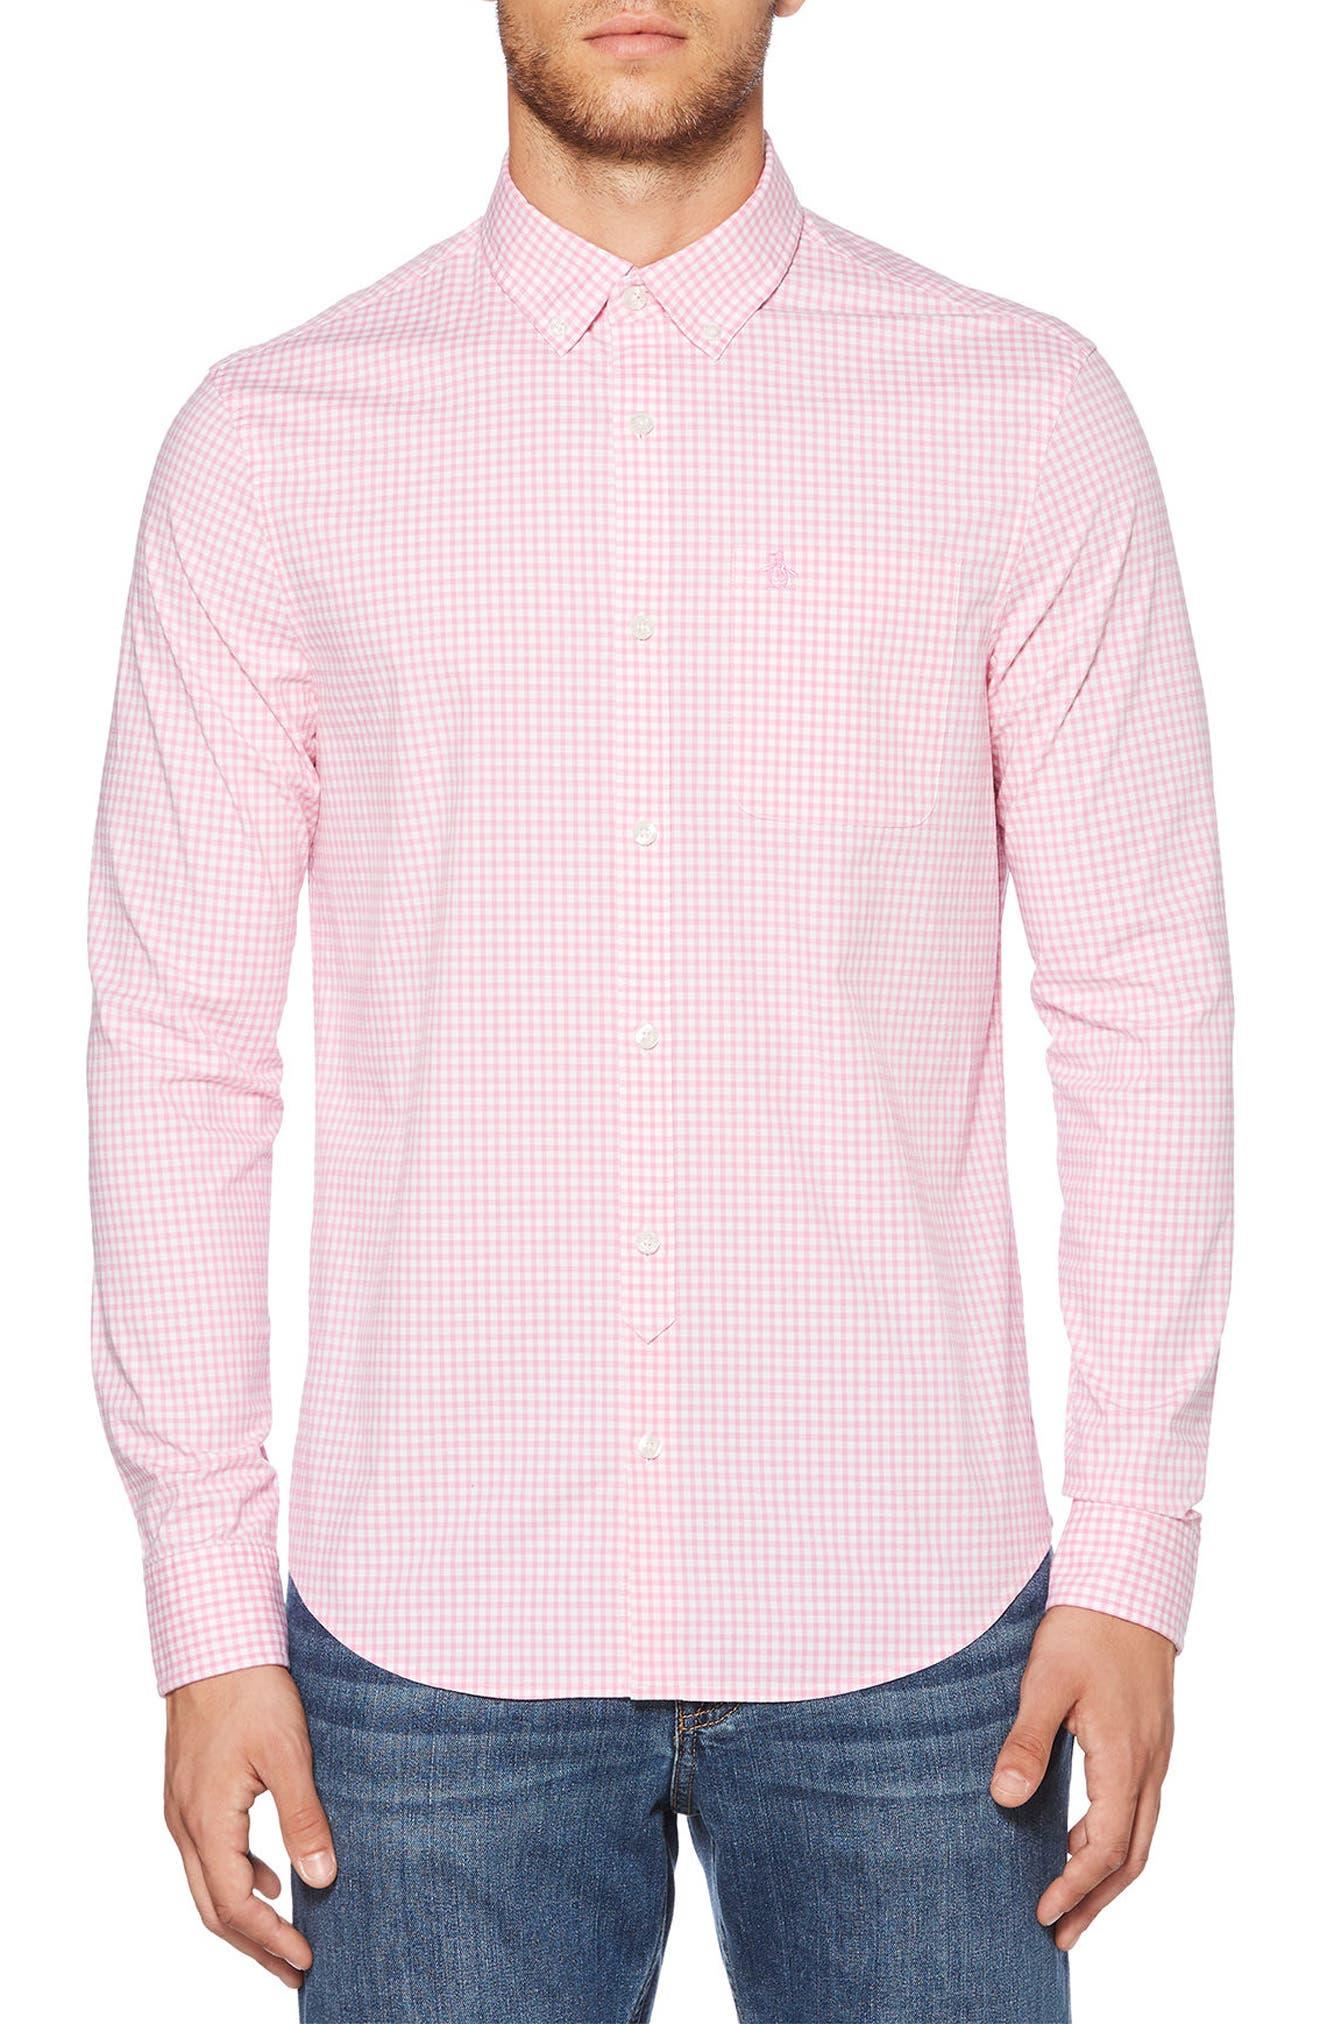 Gingham Shirt,                         Main,                         color, Fuchsia Pink